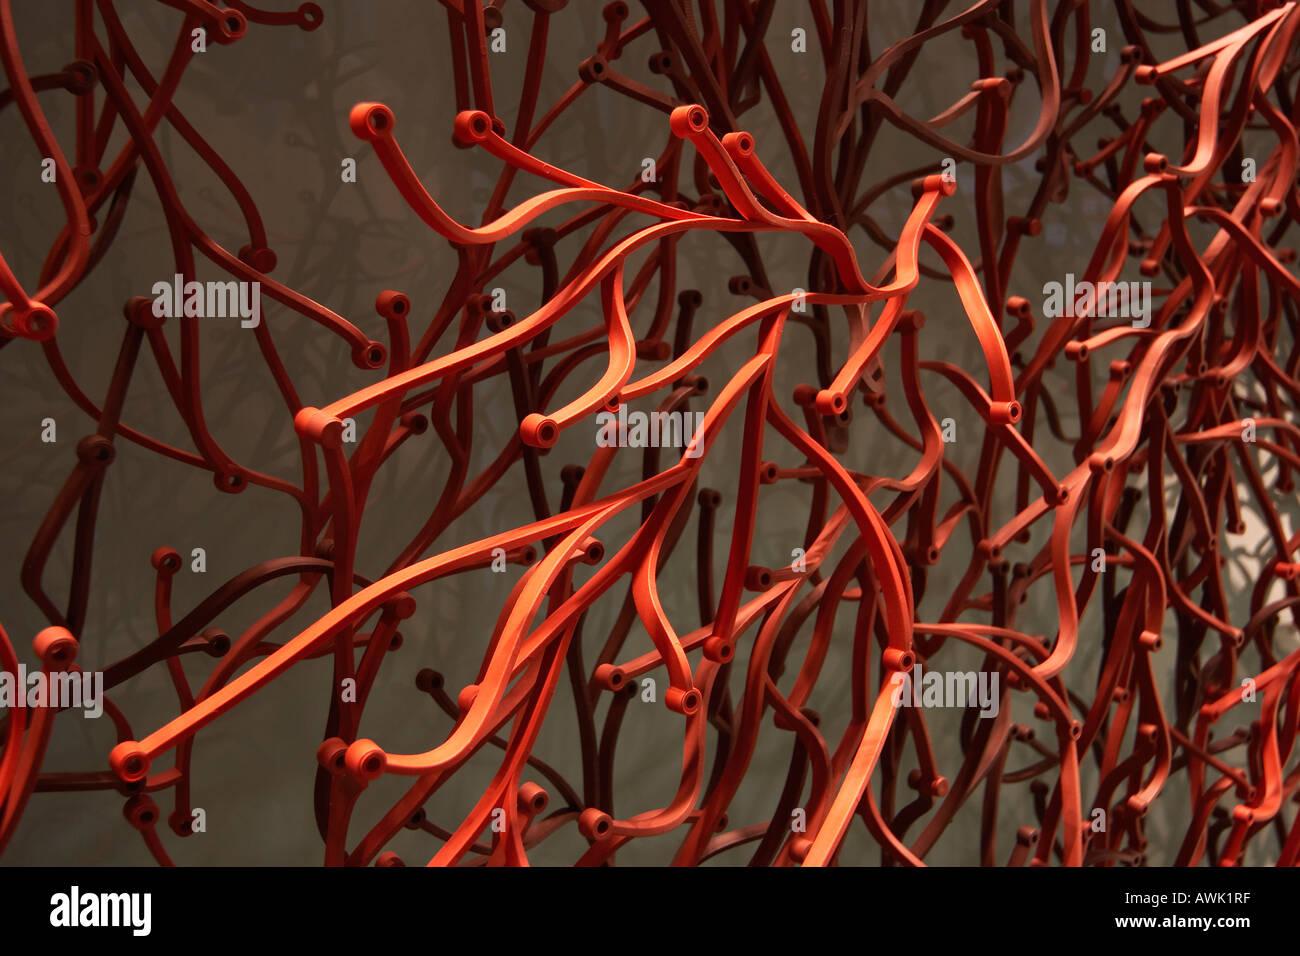 Roter Kunststoff Abstrakte Skulptur Wand Im Burogebaude Aufzug Foyer Stadt Von London Ec2 England Stockfotografie Alamy